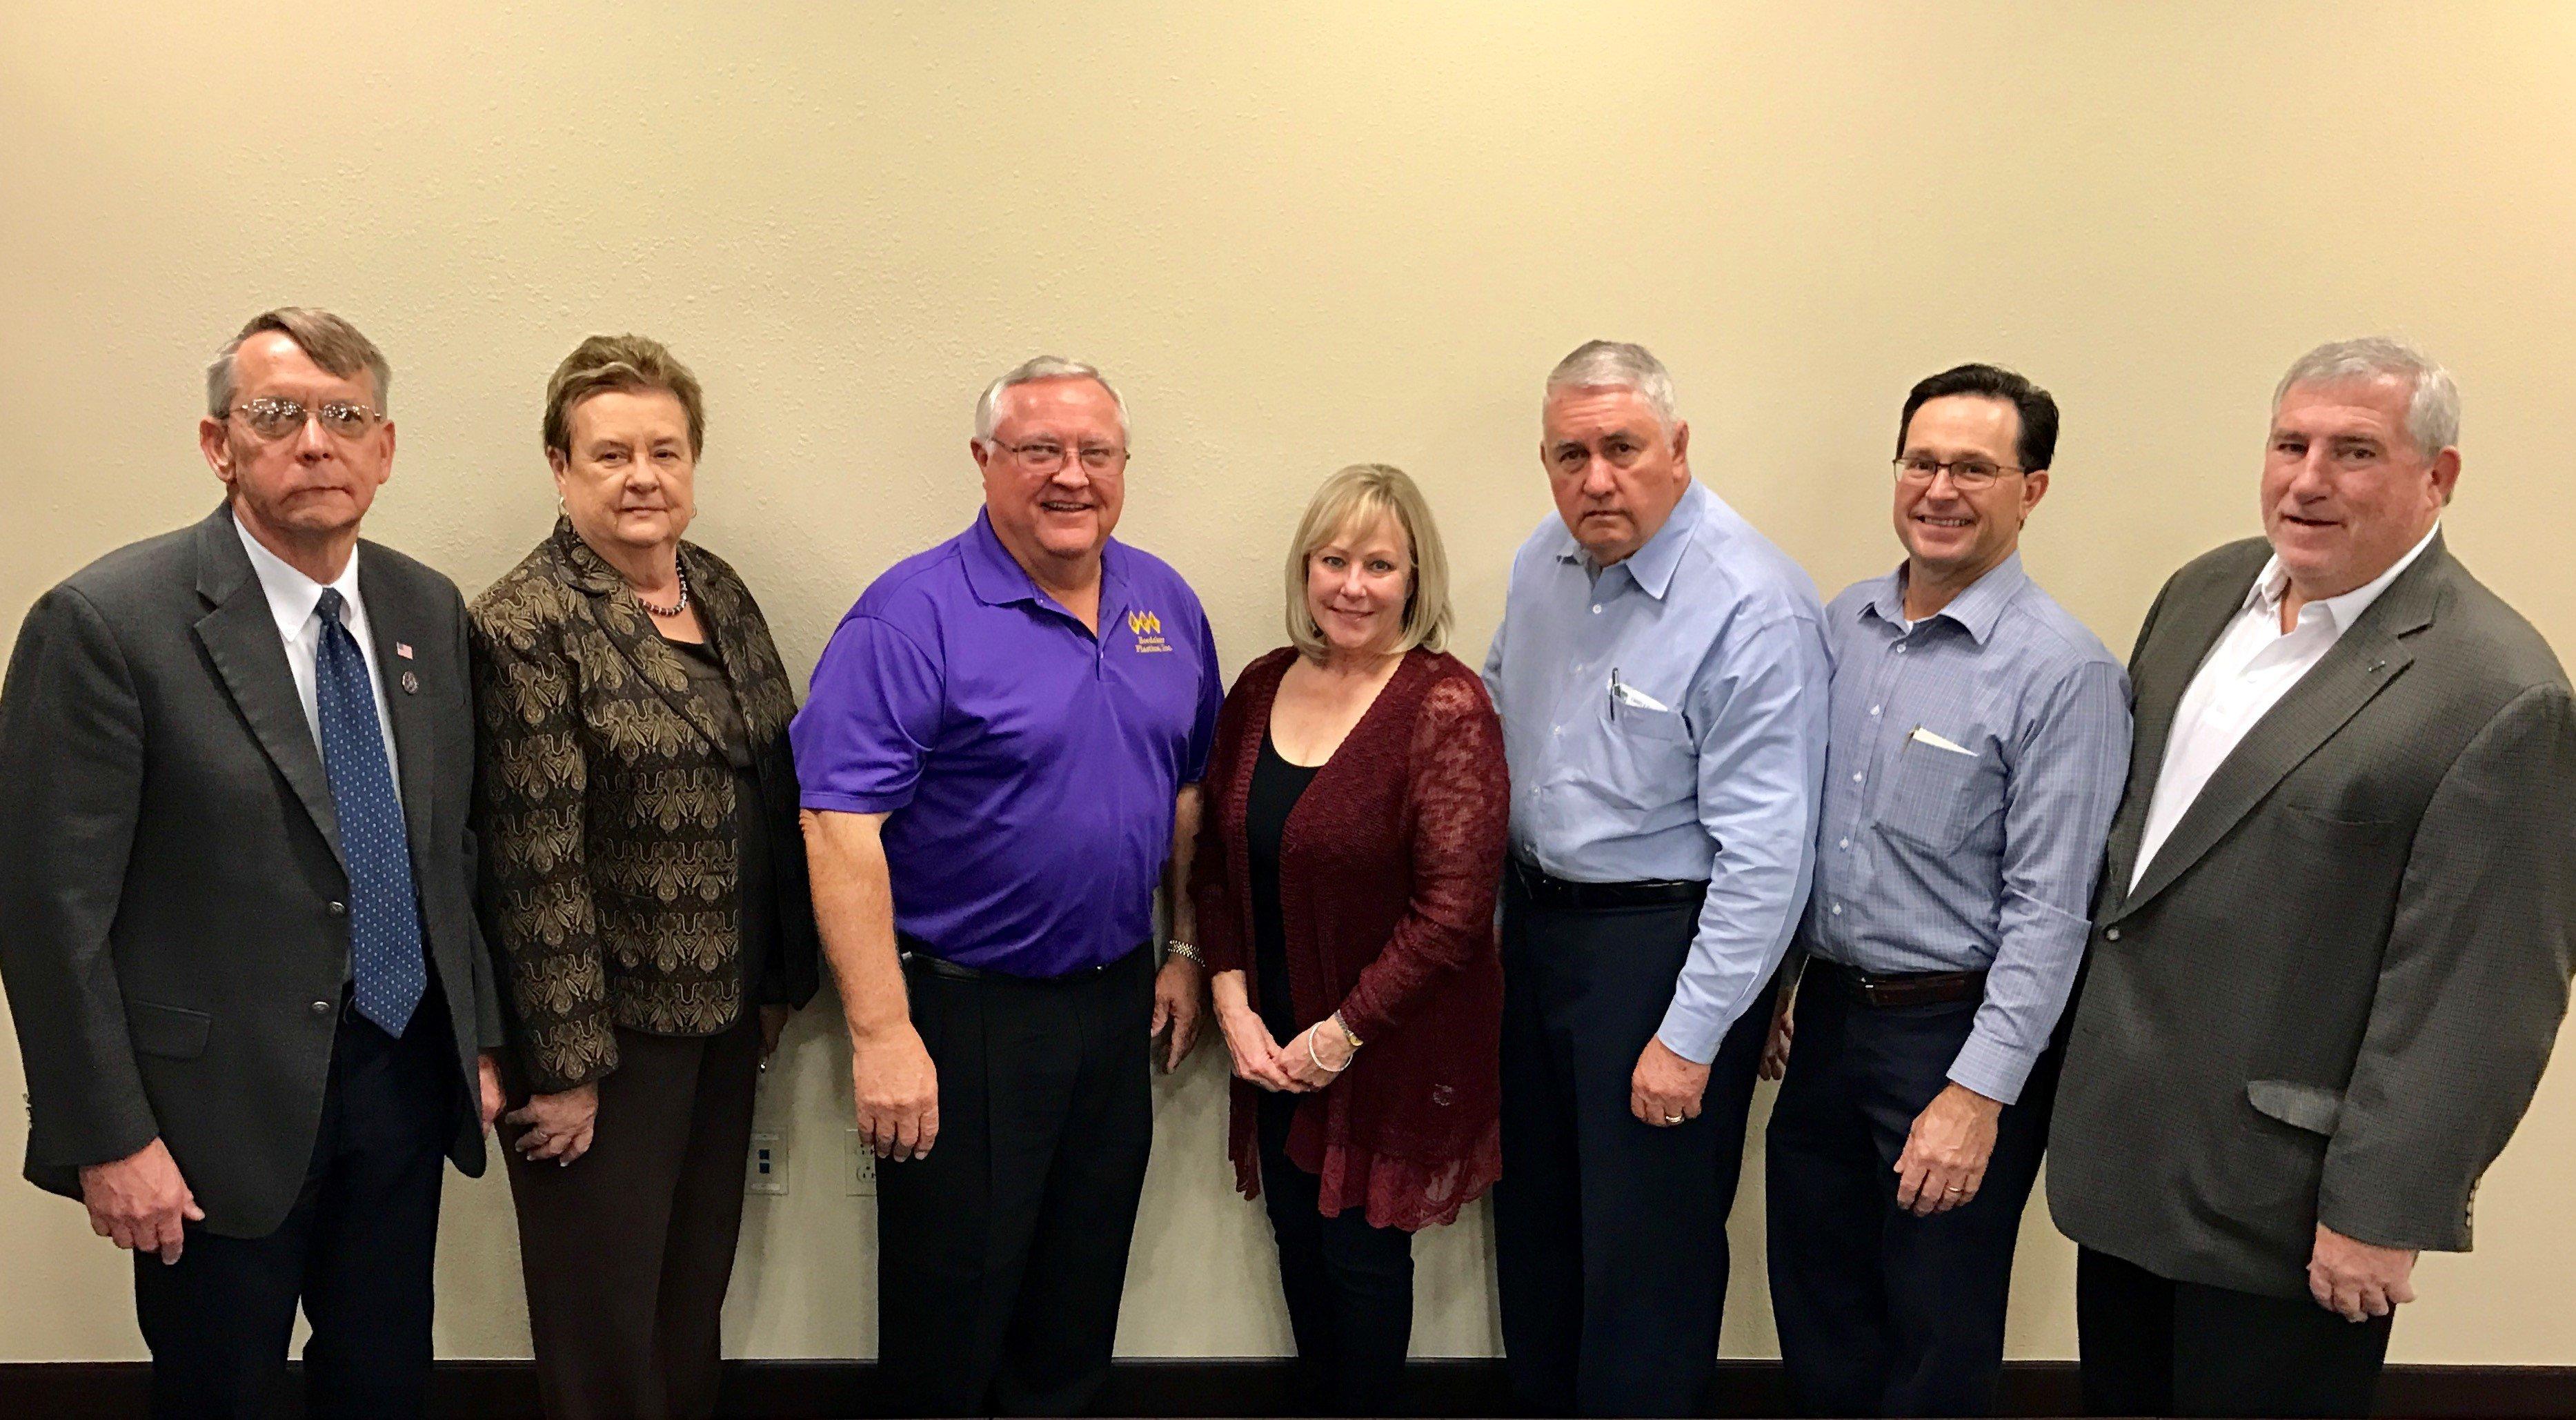 Yoakum Community Hospital Board of Trustees